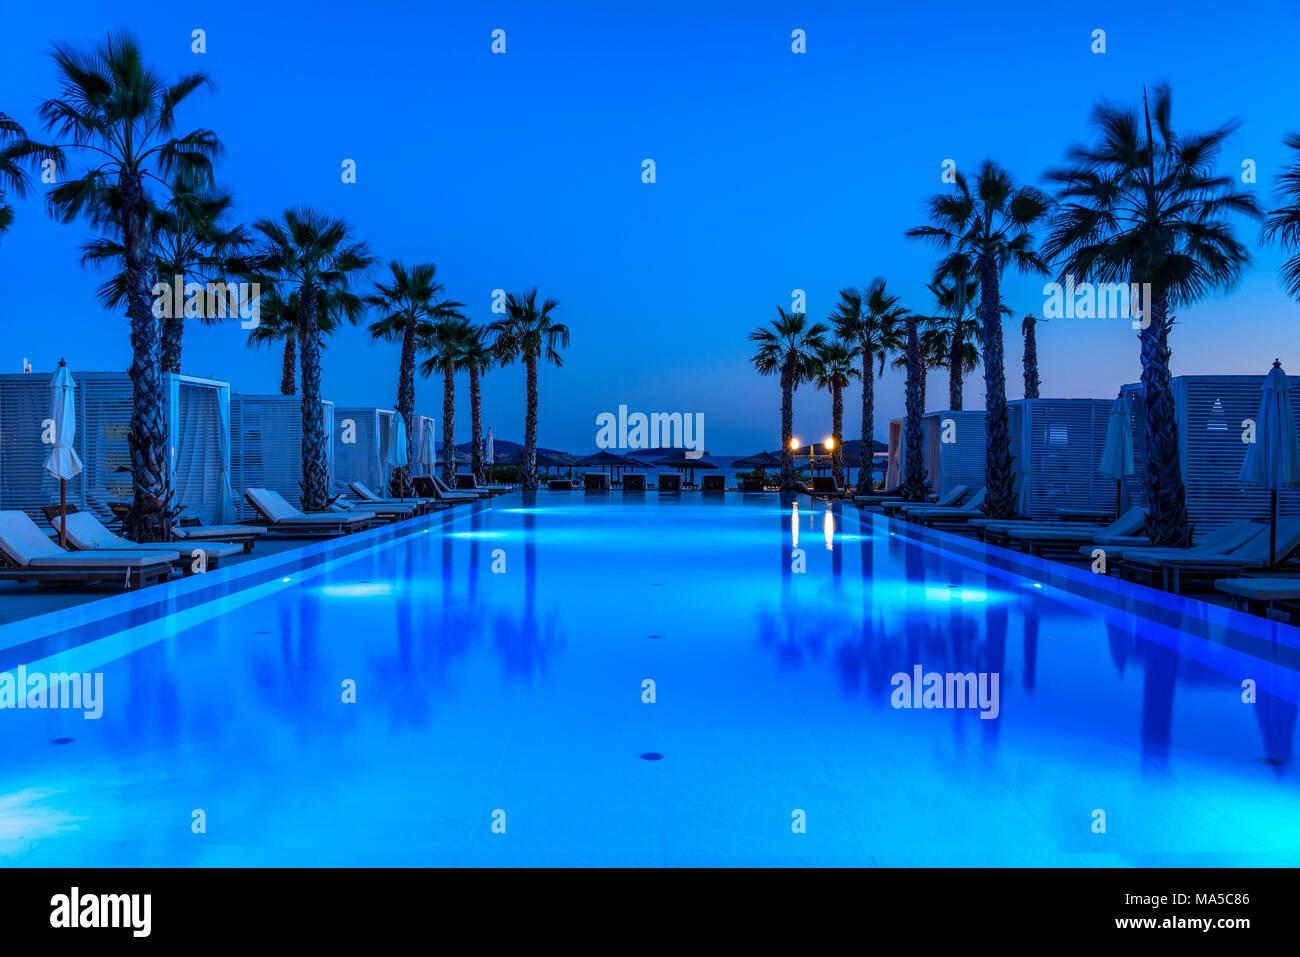 Croatia, Dalmatia, Sibenik, Solaris Beach Resort, Lifestyle Hotel Jure, Pool - Stock Image